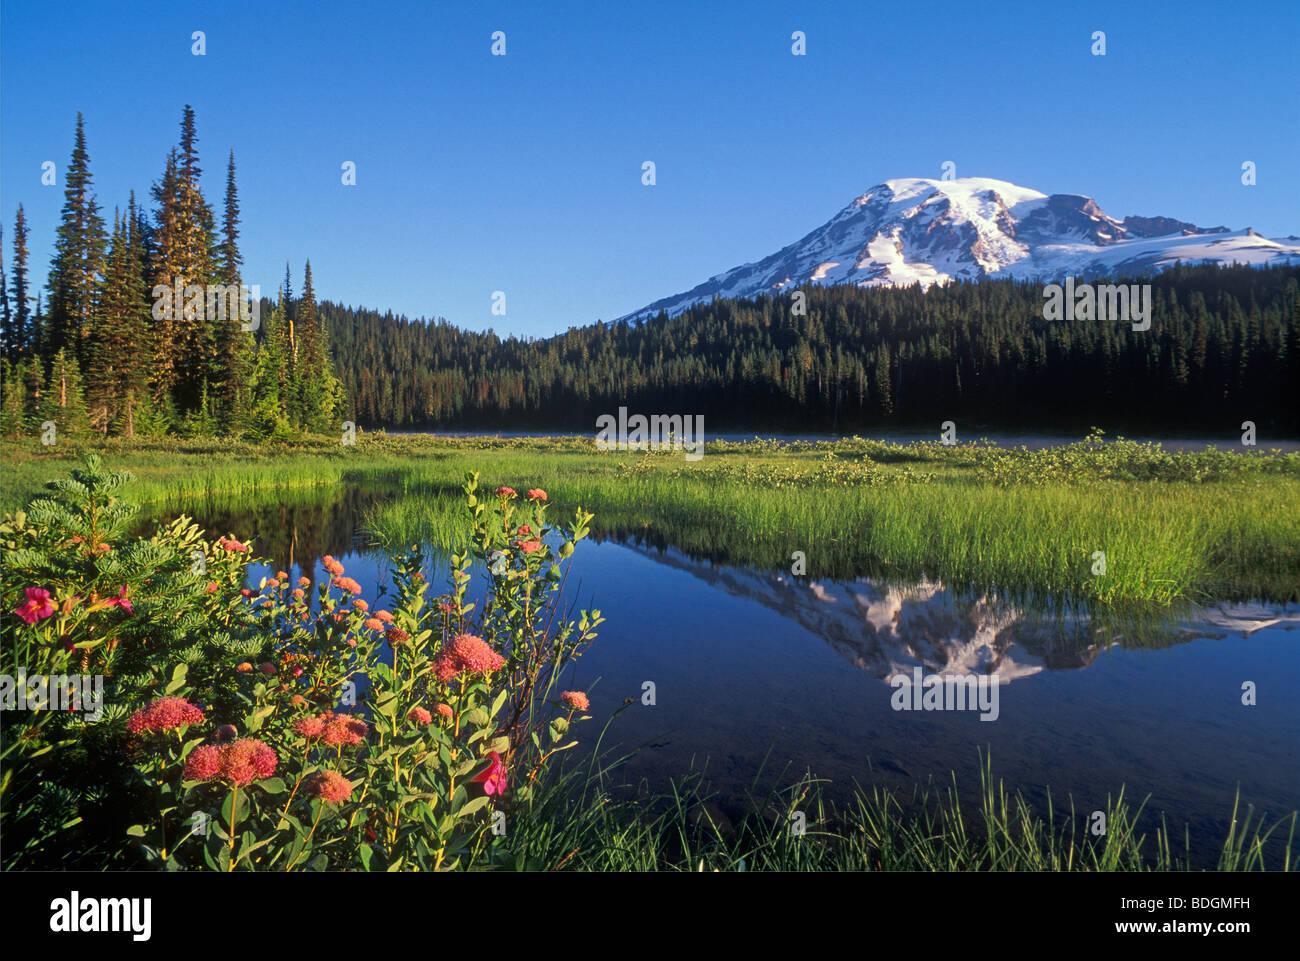 Mount Rainier and Reflection Lake; Mount Rainier National Park, Washington. - Stock Image